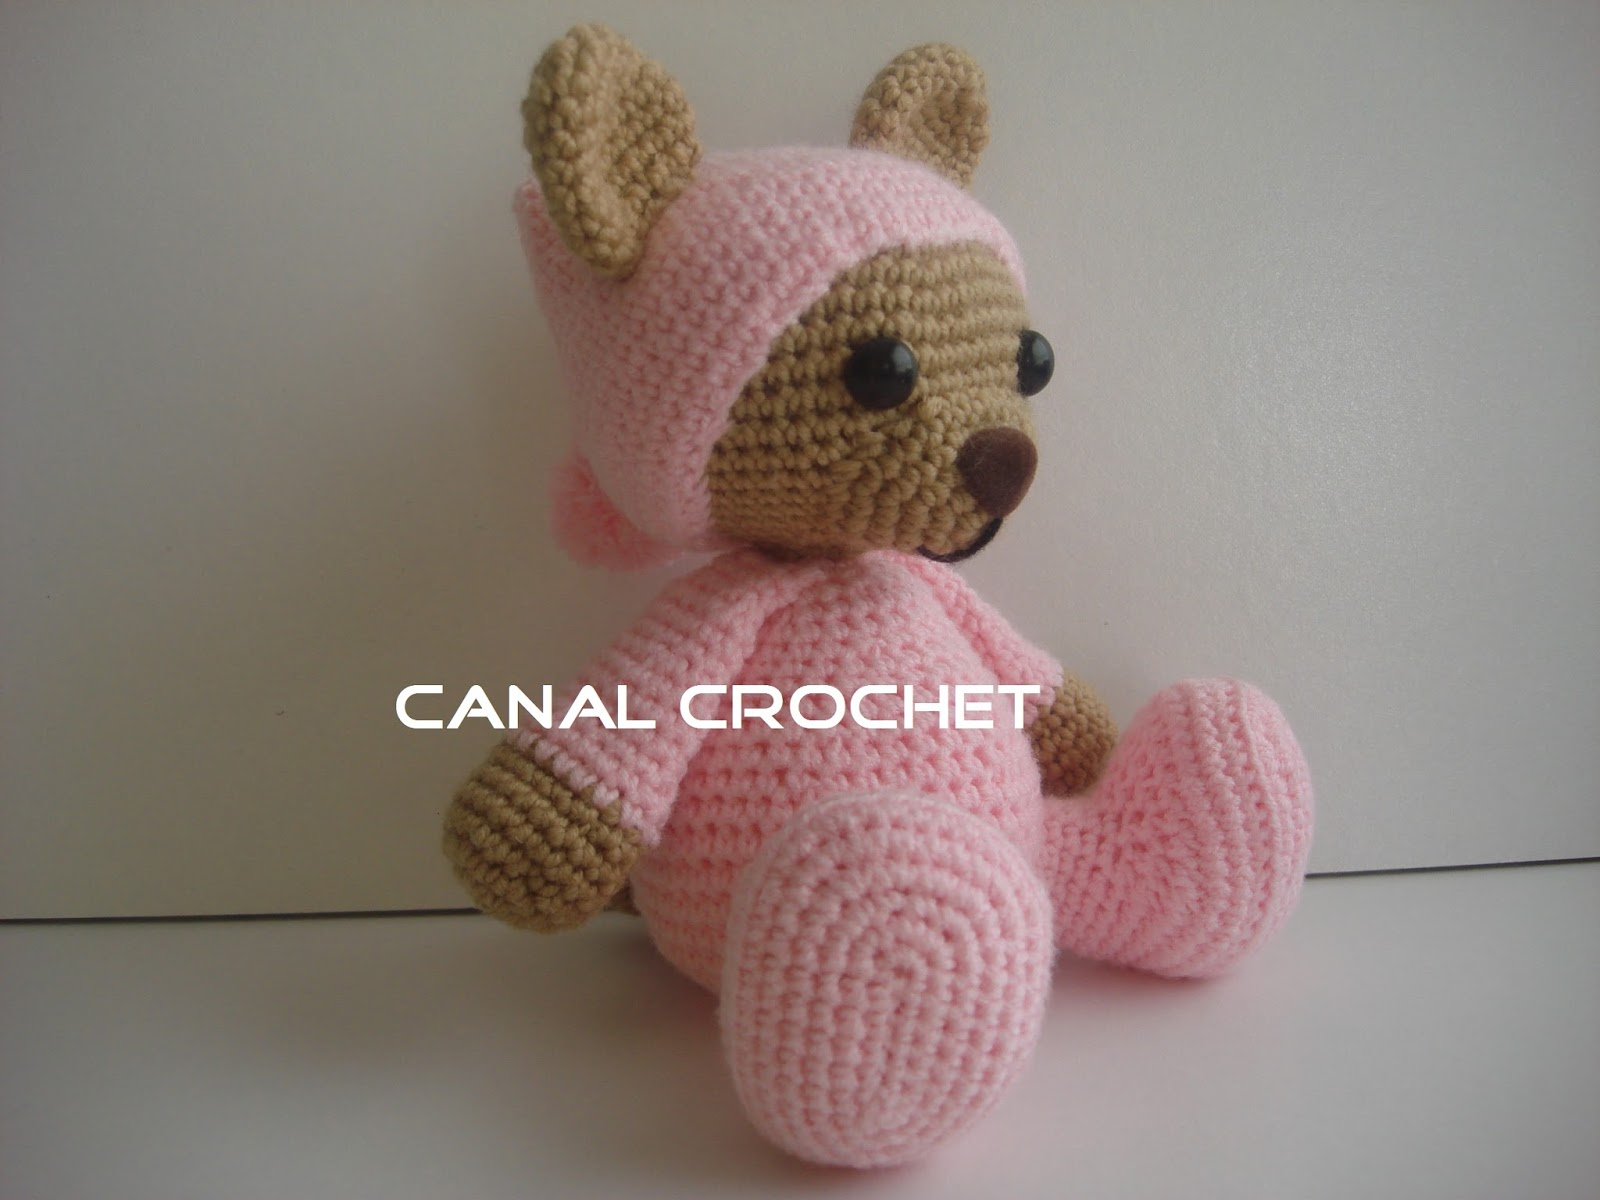 canal crochet oso pijama amigurumi. Black Bedroom Furniture Sets. Home Design Ideas